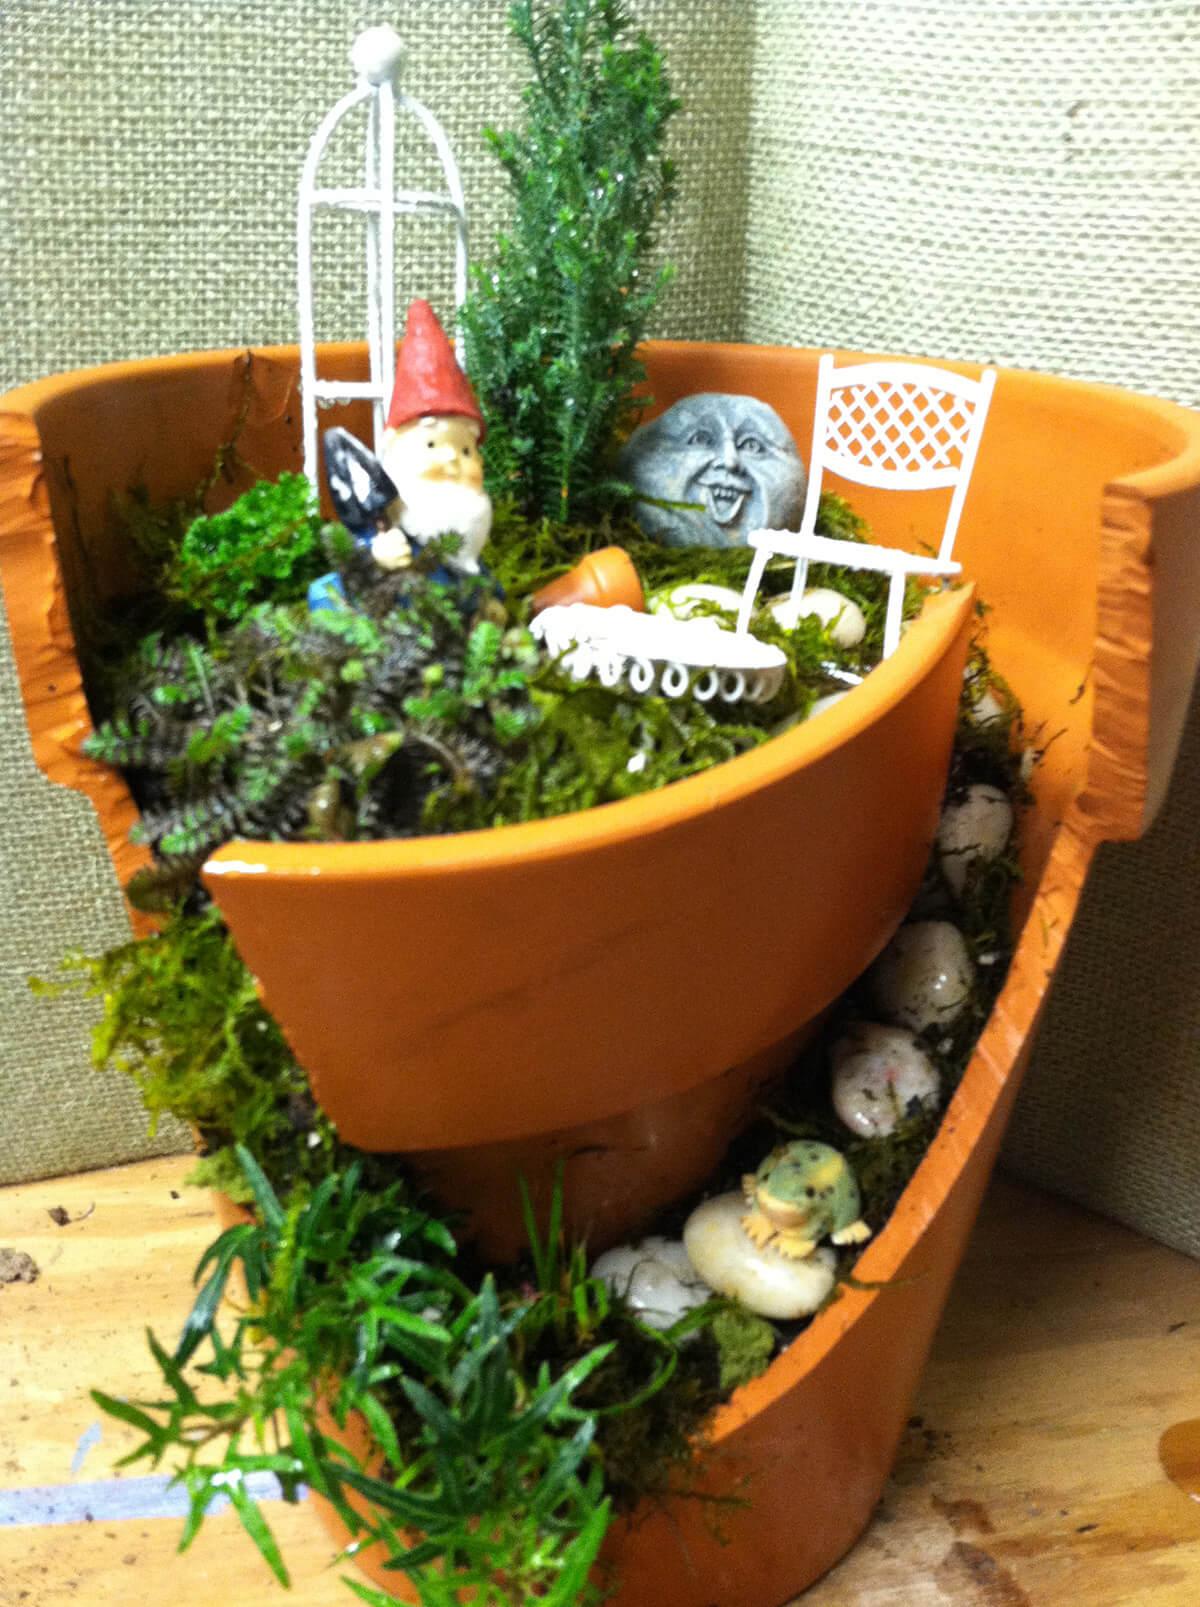 Broken Pot Garden for Gnomes